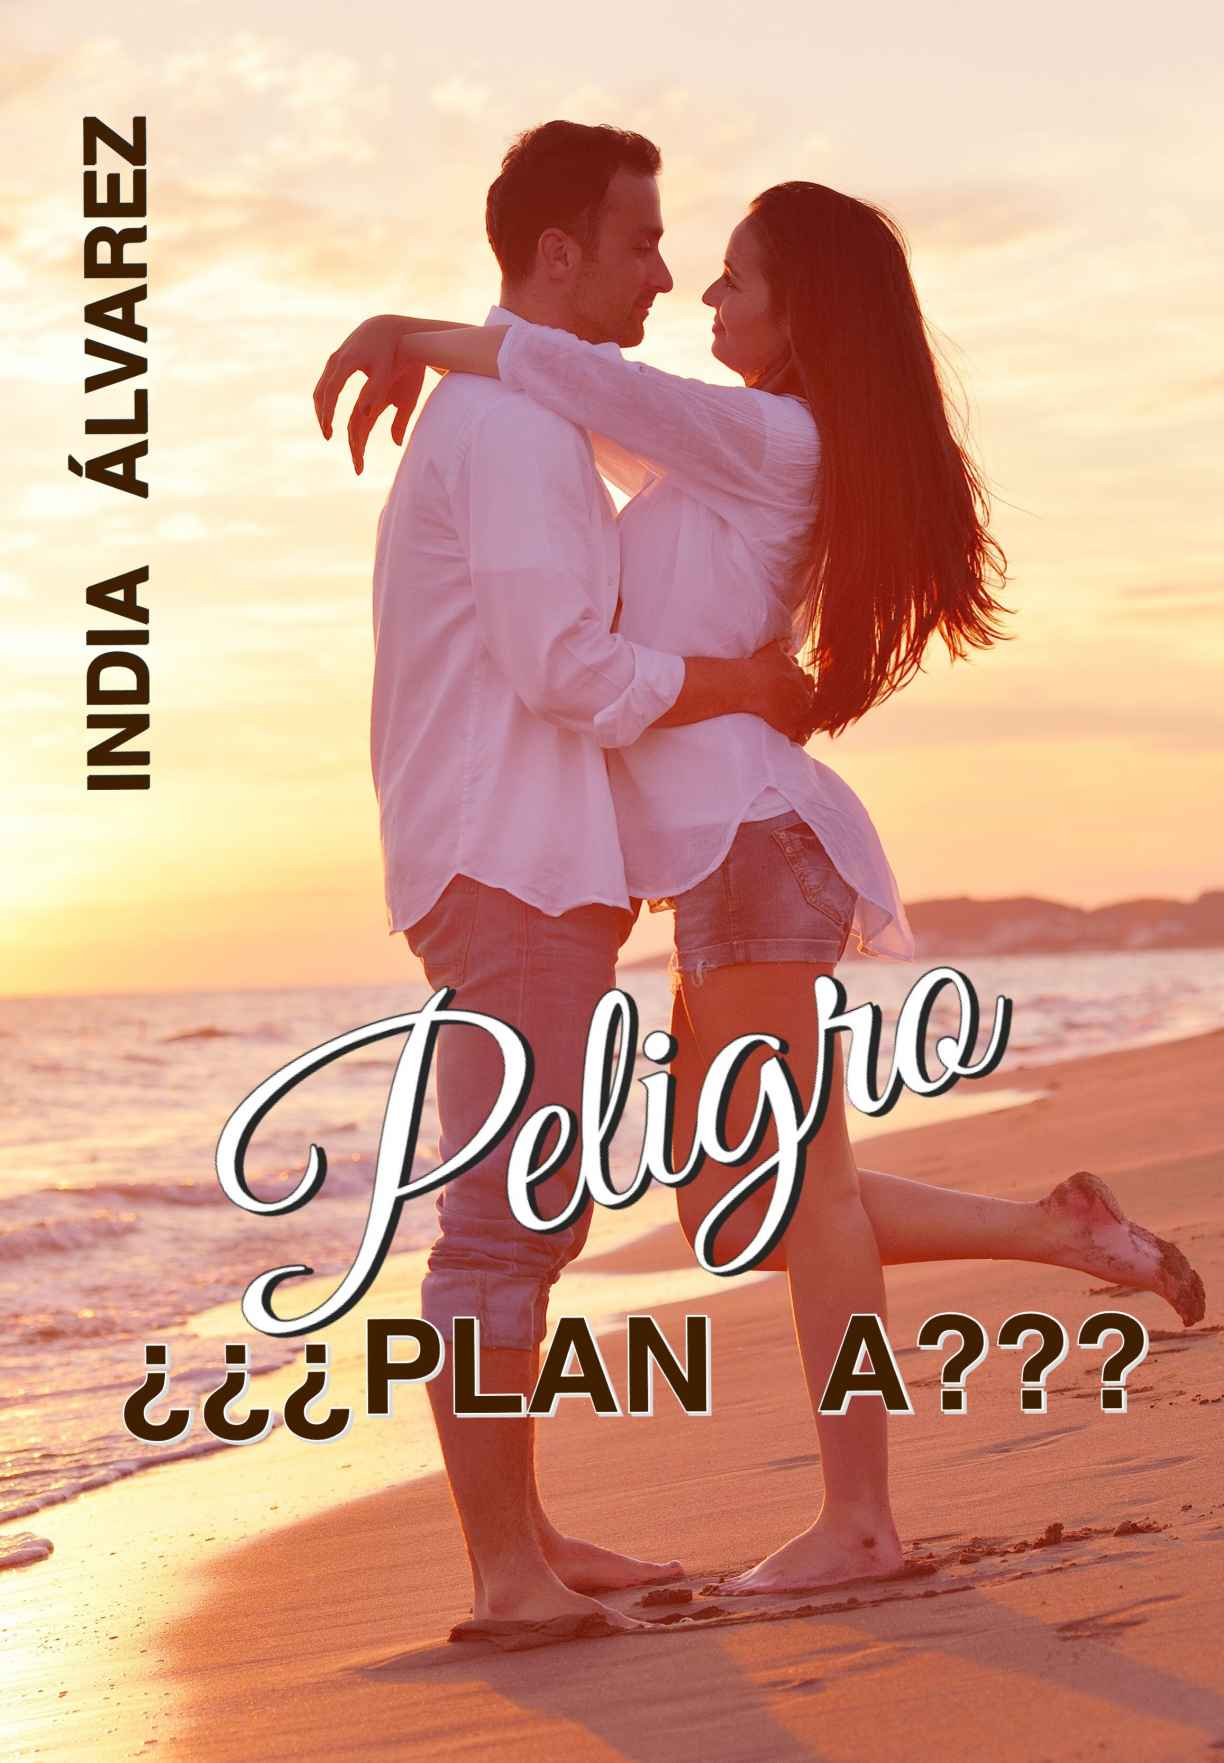 Peligro ¿¿¿Plan a??? - India Álvarez